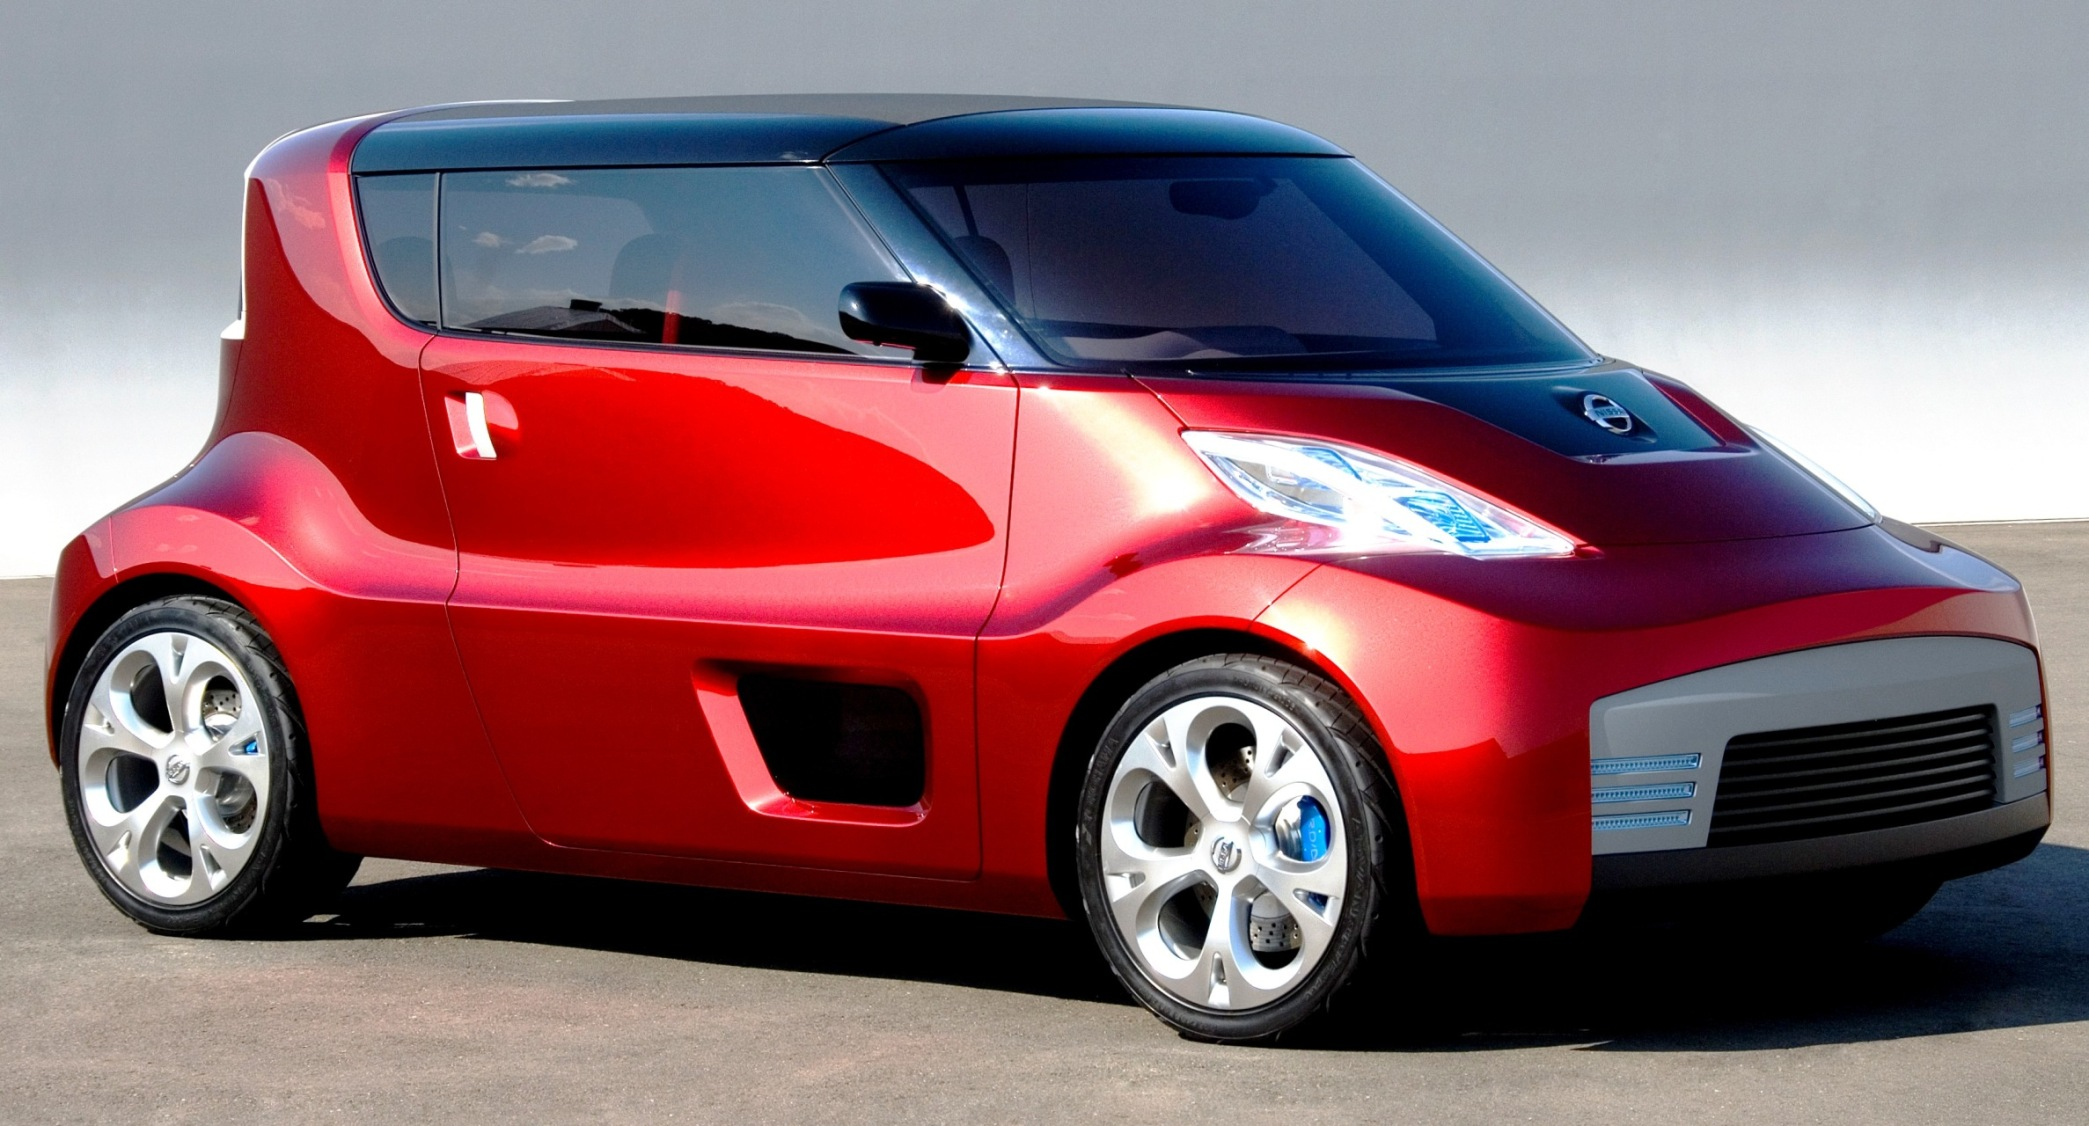 concept flashback 2007 nissan round box is leaf cube iq roadster mashup. Black Bedroom Furniture Sets. Home Design Ideas